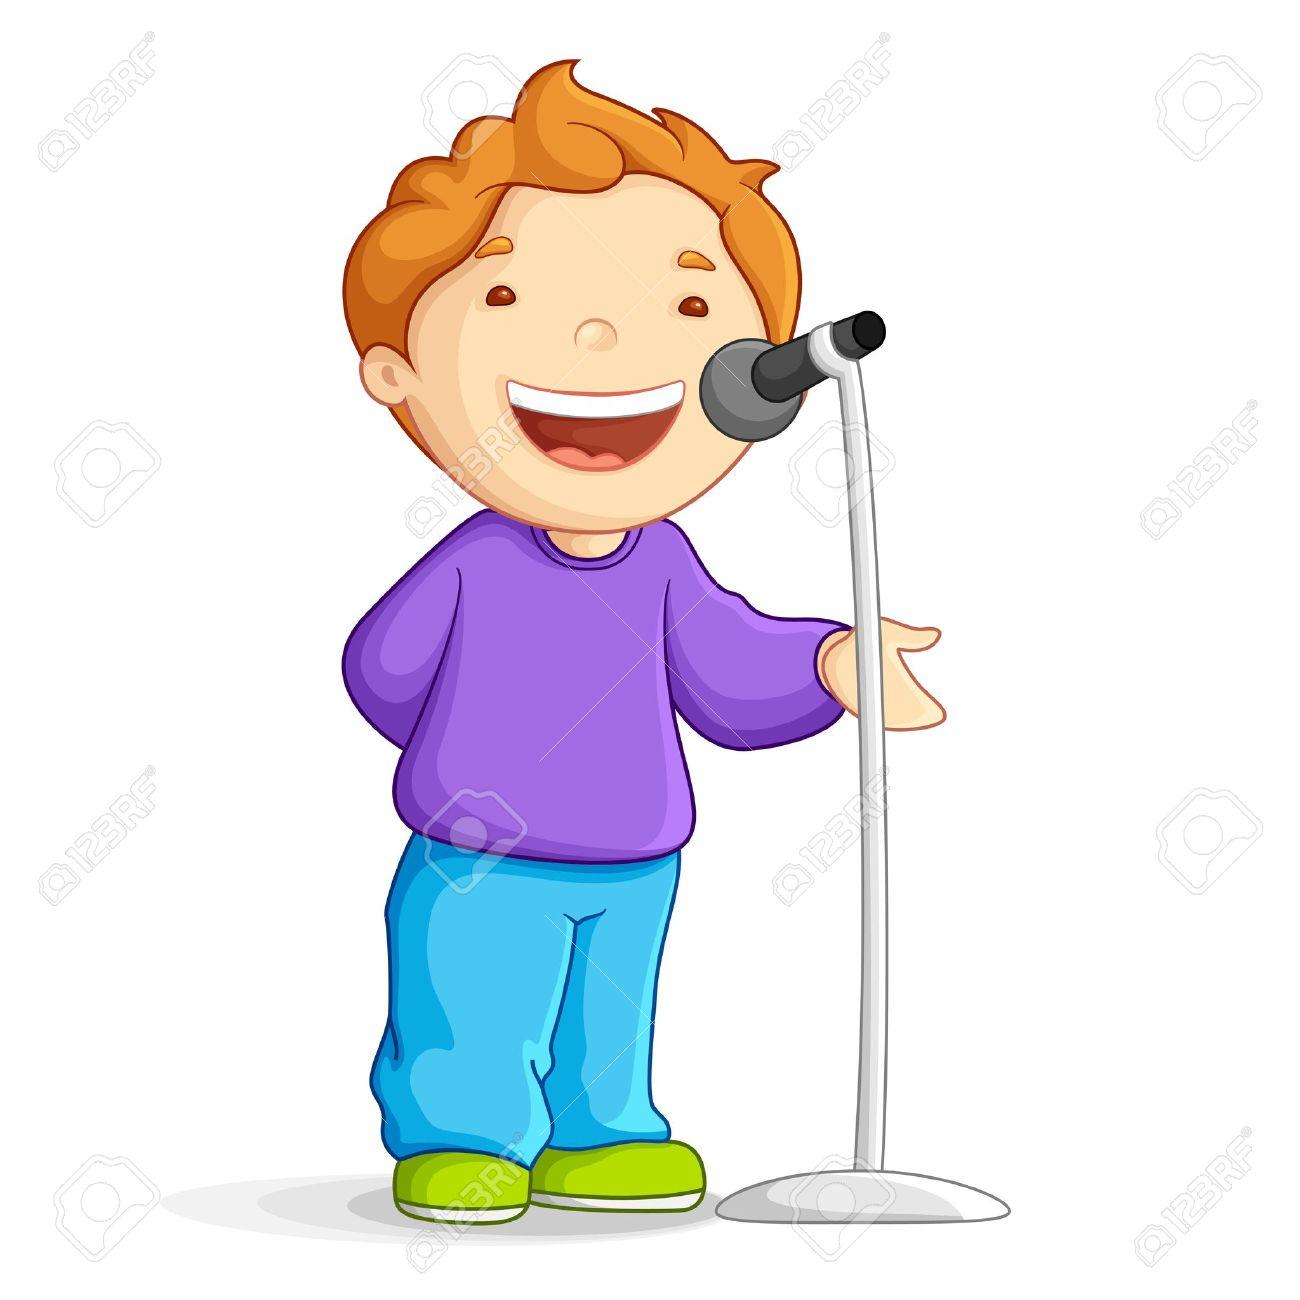 Singing Clipart & Singing Clip Art Images.